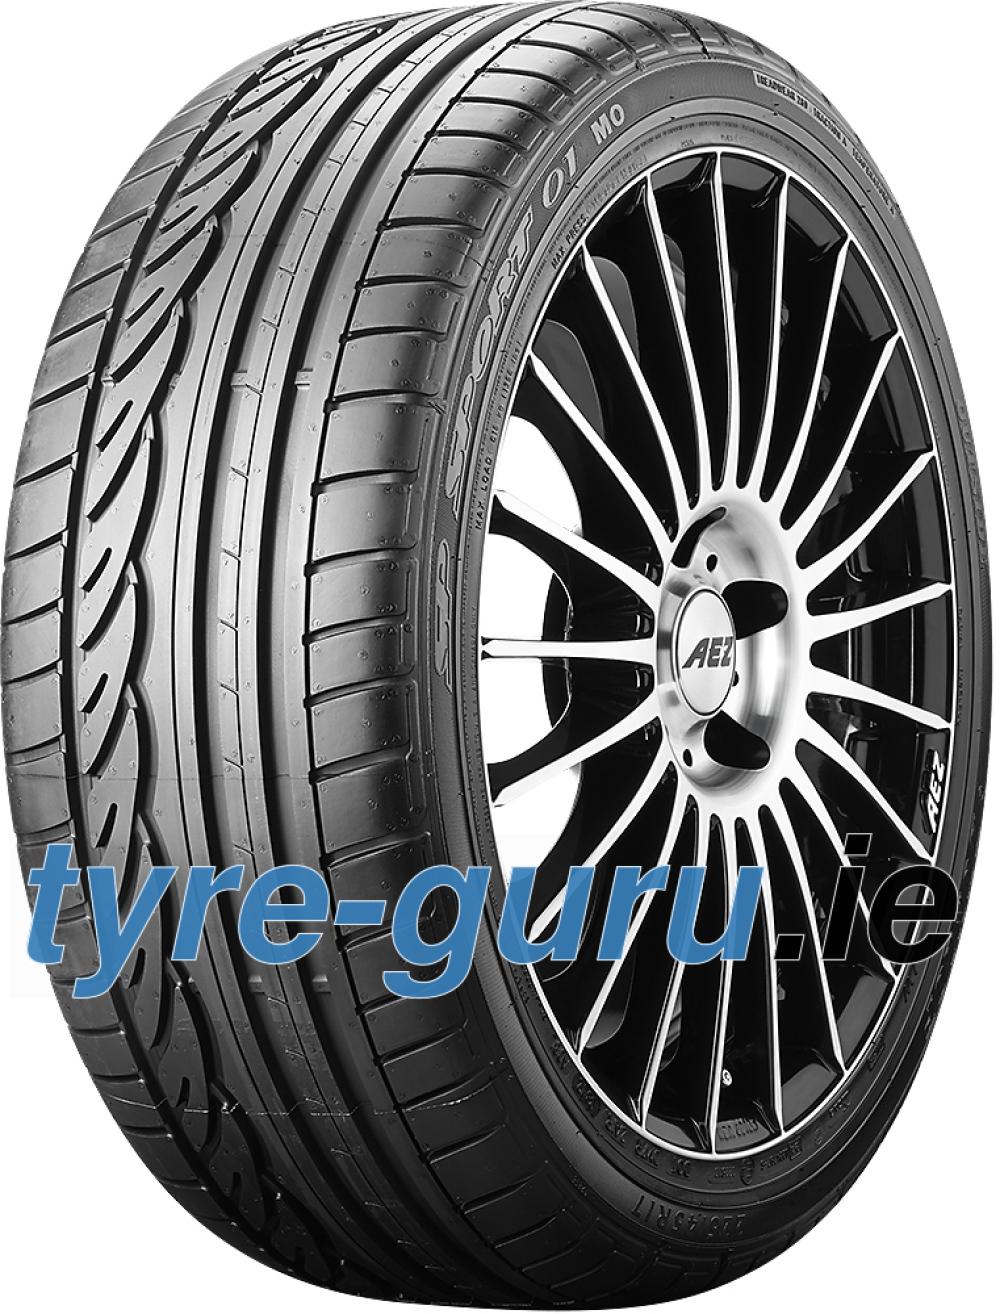 Tires Dunlop SP Sport 01